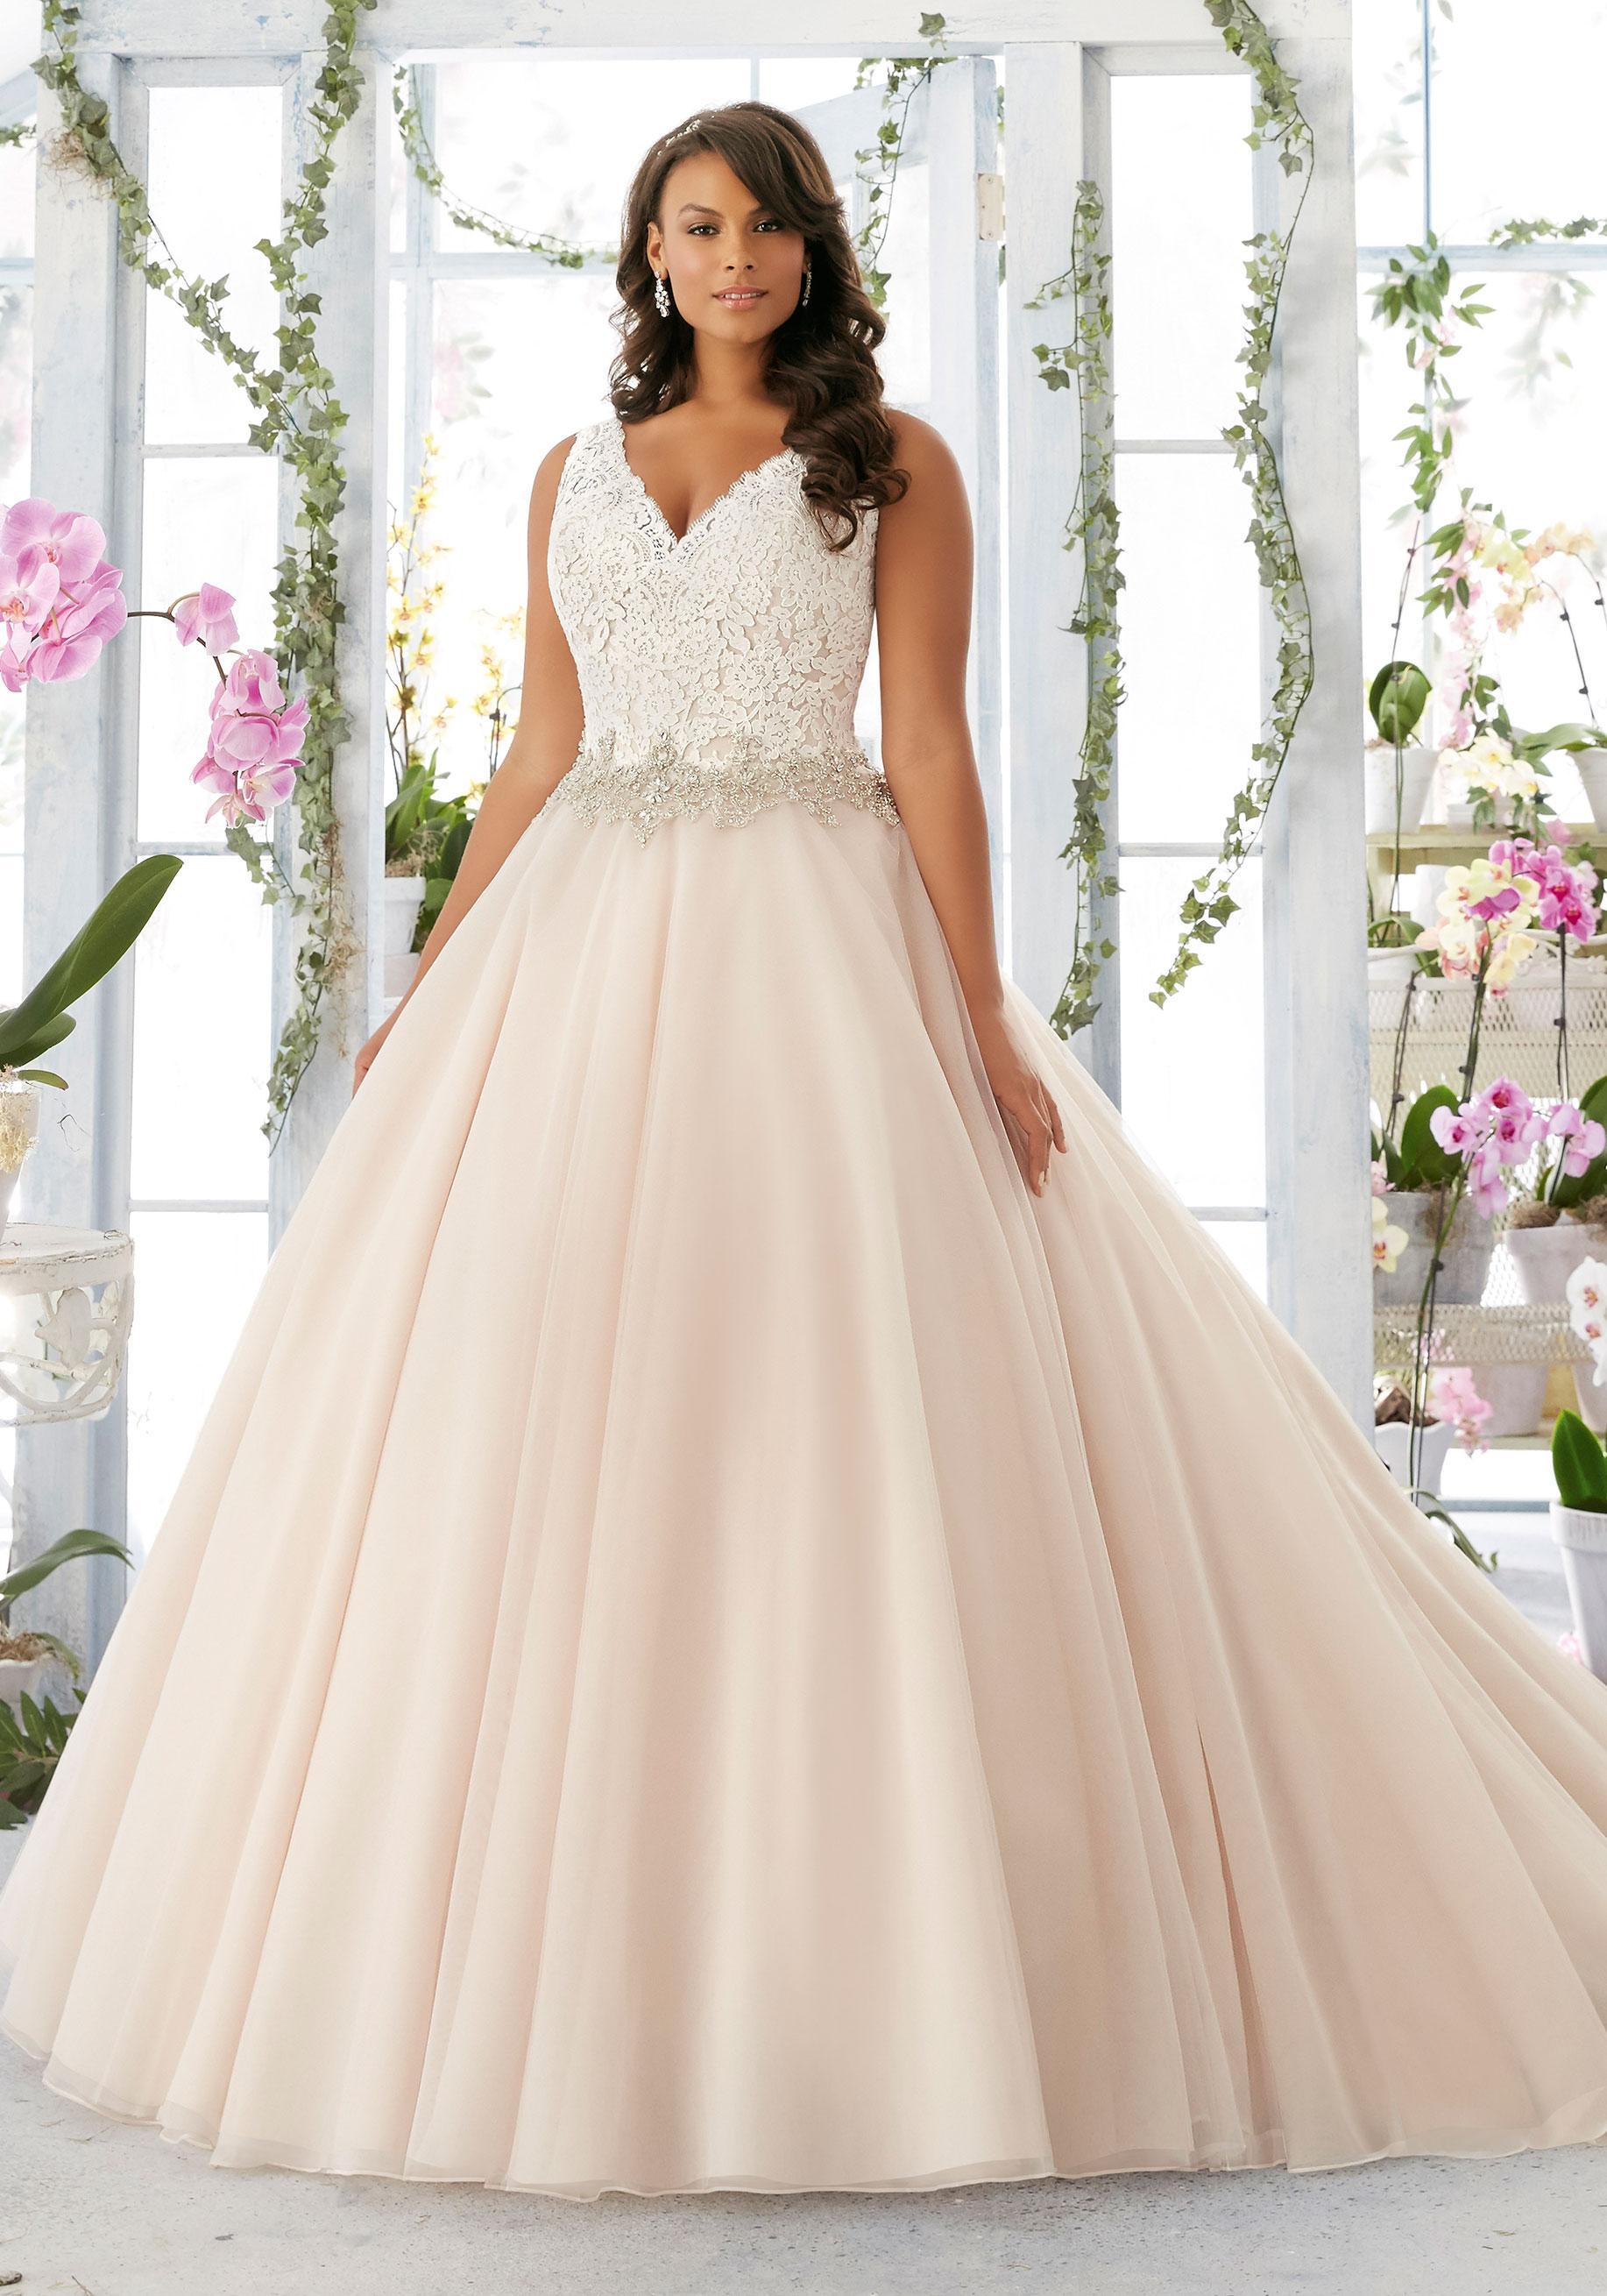 65316265fa96 Mori lee 3198 wedding dress - Catrinas Bridal